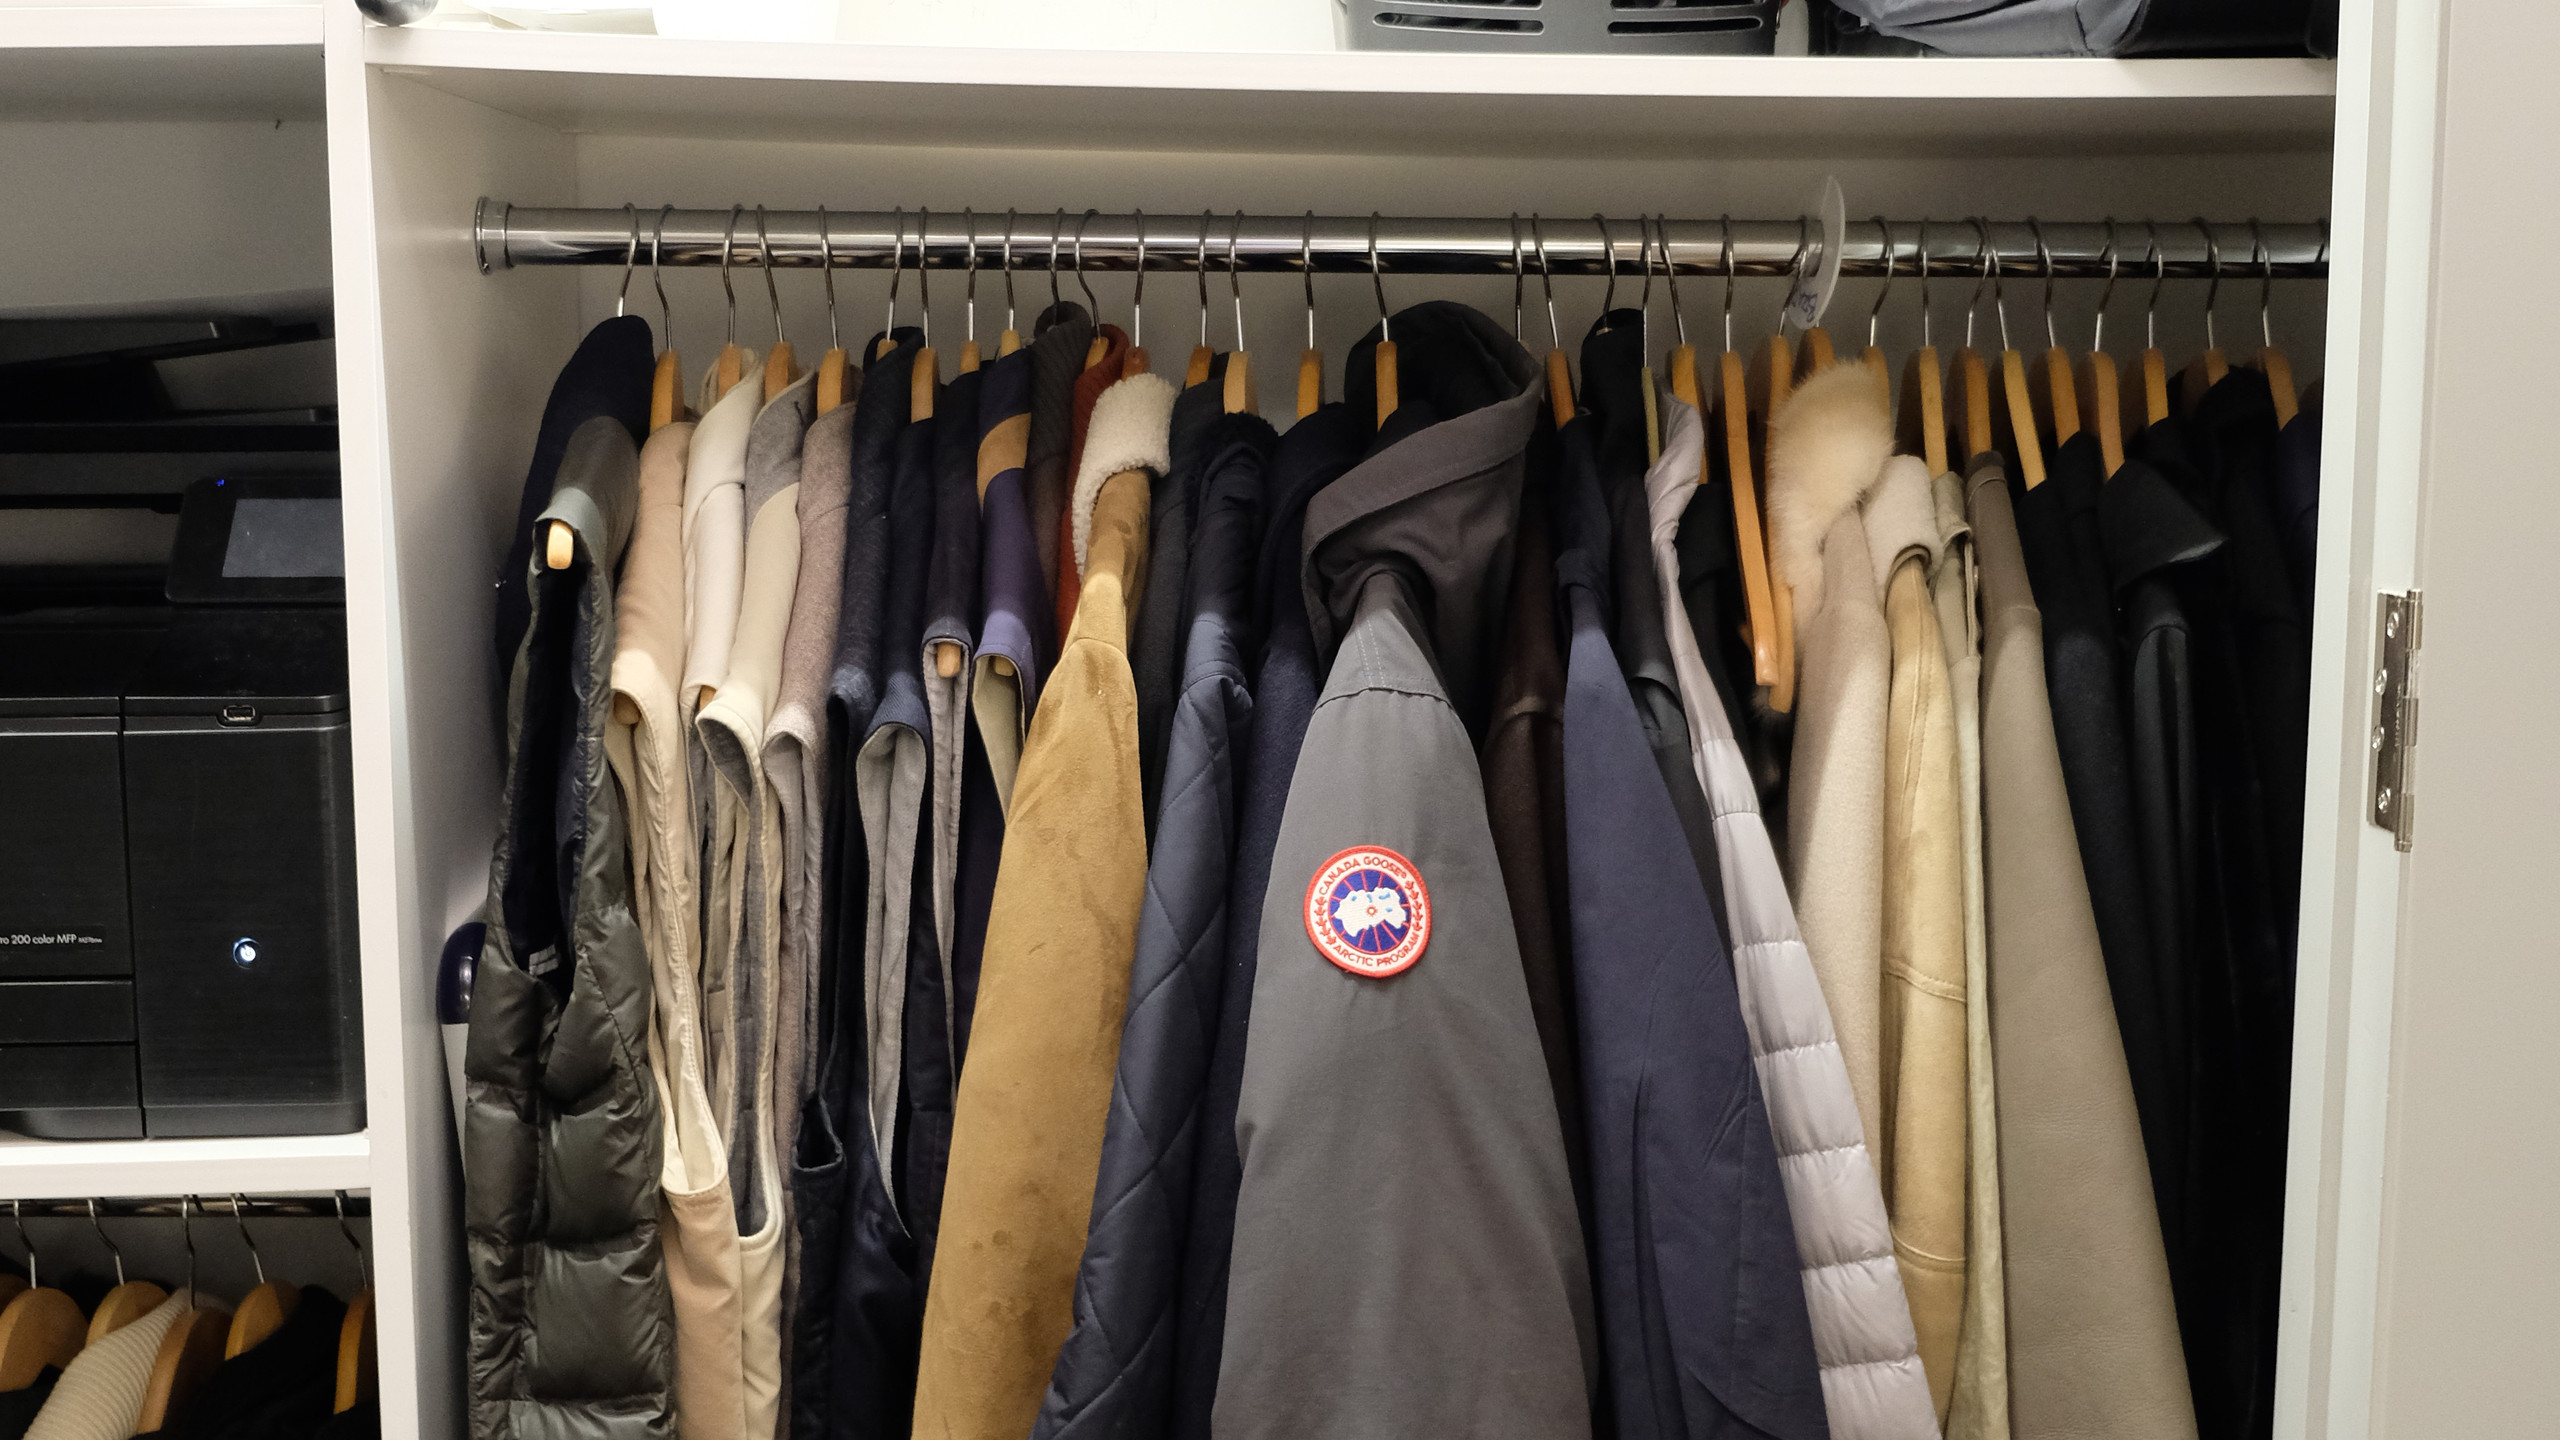 Closet organization after